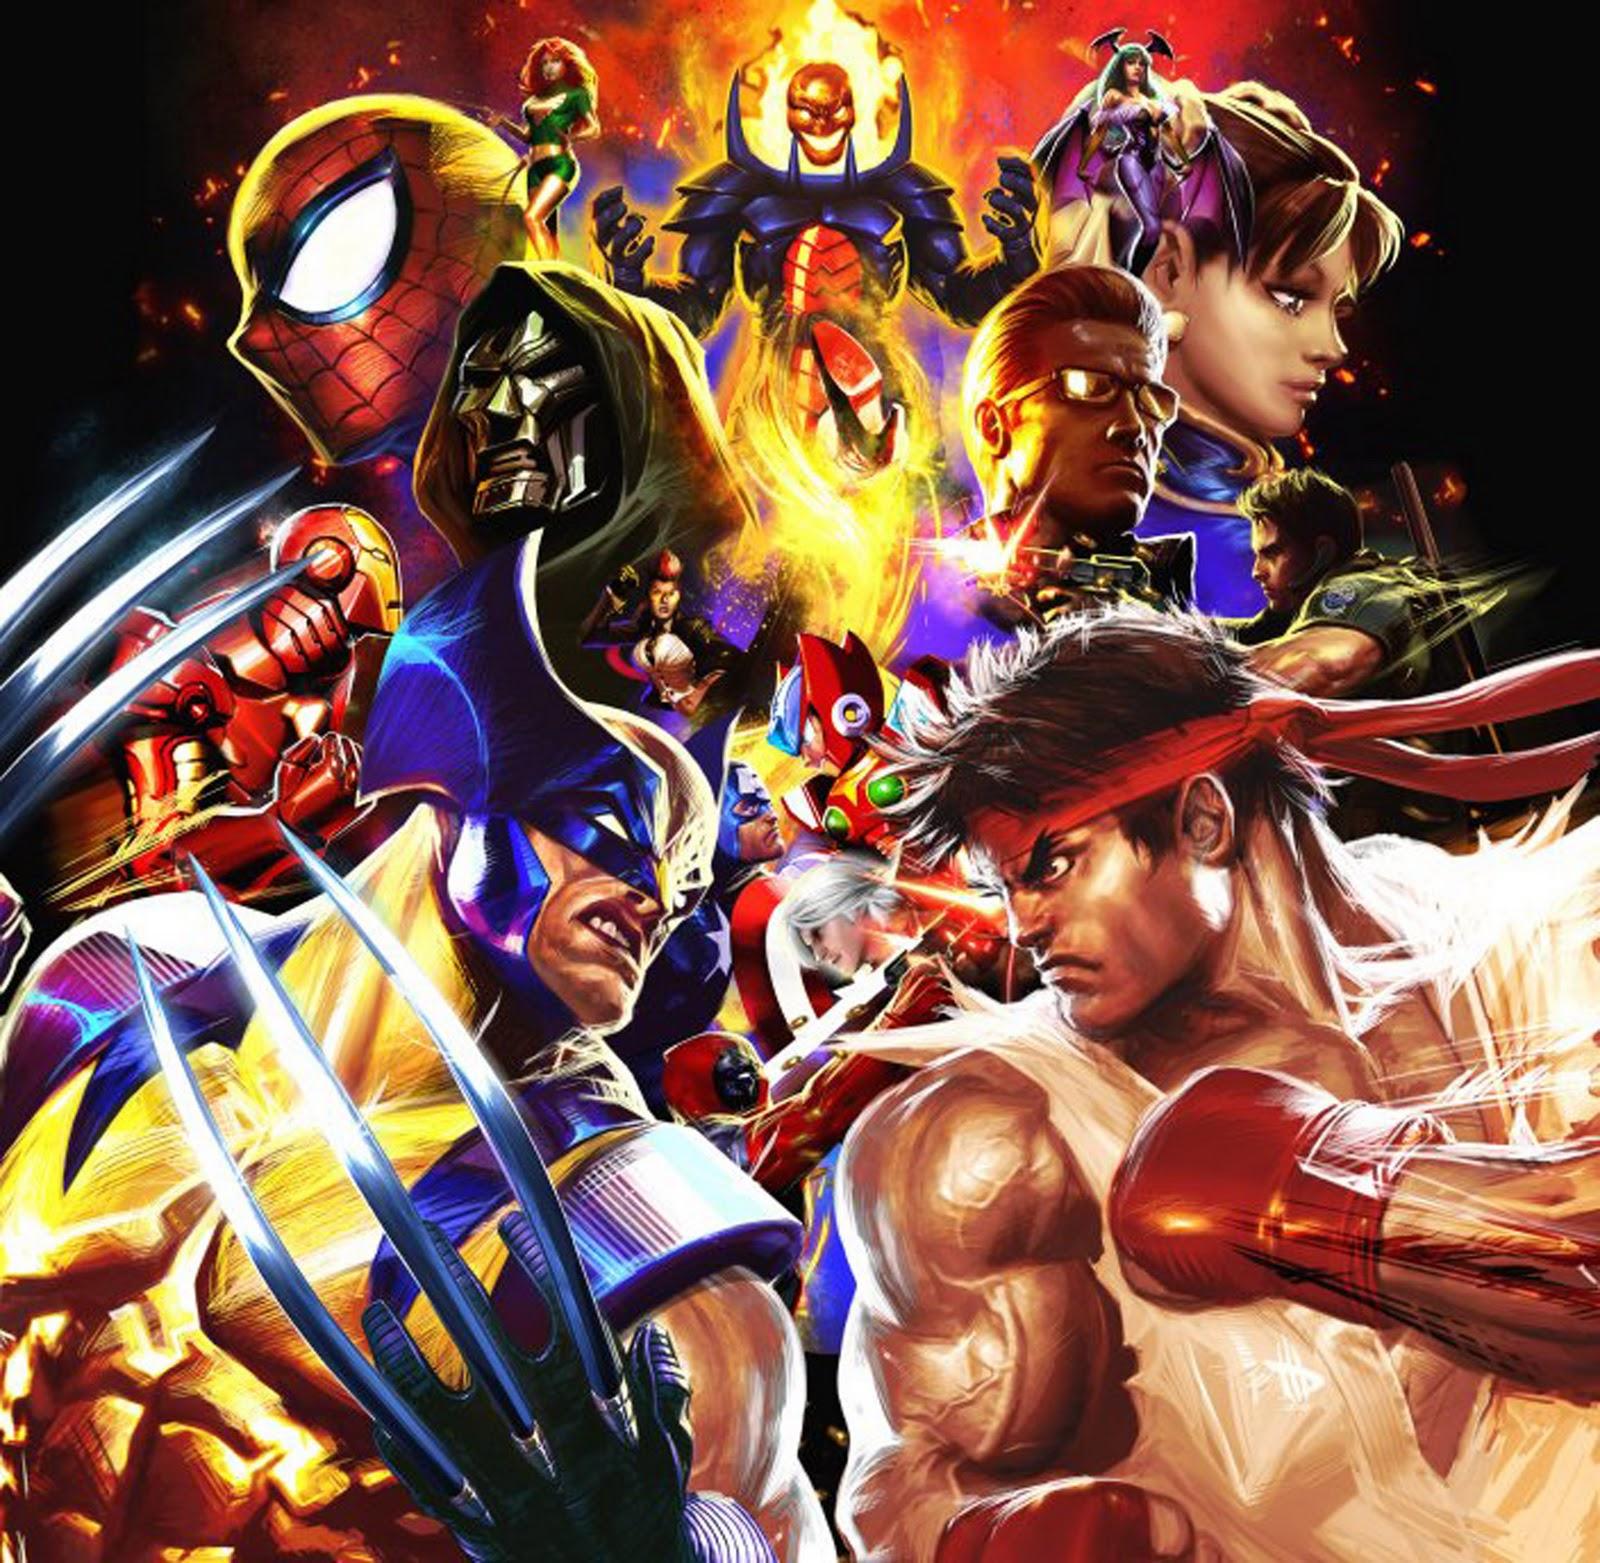 http://4.bp.blogspot.com/-MbN-slprK94/TwlskyCMVHI/AAAAAAAADEc/rB8iyU1anJI/s1600/marvel+vs+capcom+super+street+fighter+udon+crew+poster+wallpaper+sf+ssf+iv+v+vi+ryu+spiderman+wolverine+ironman+chun+li+by+Dave+Wilkins.jpg